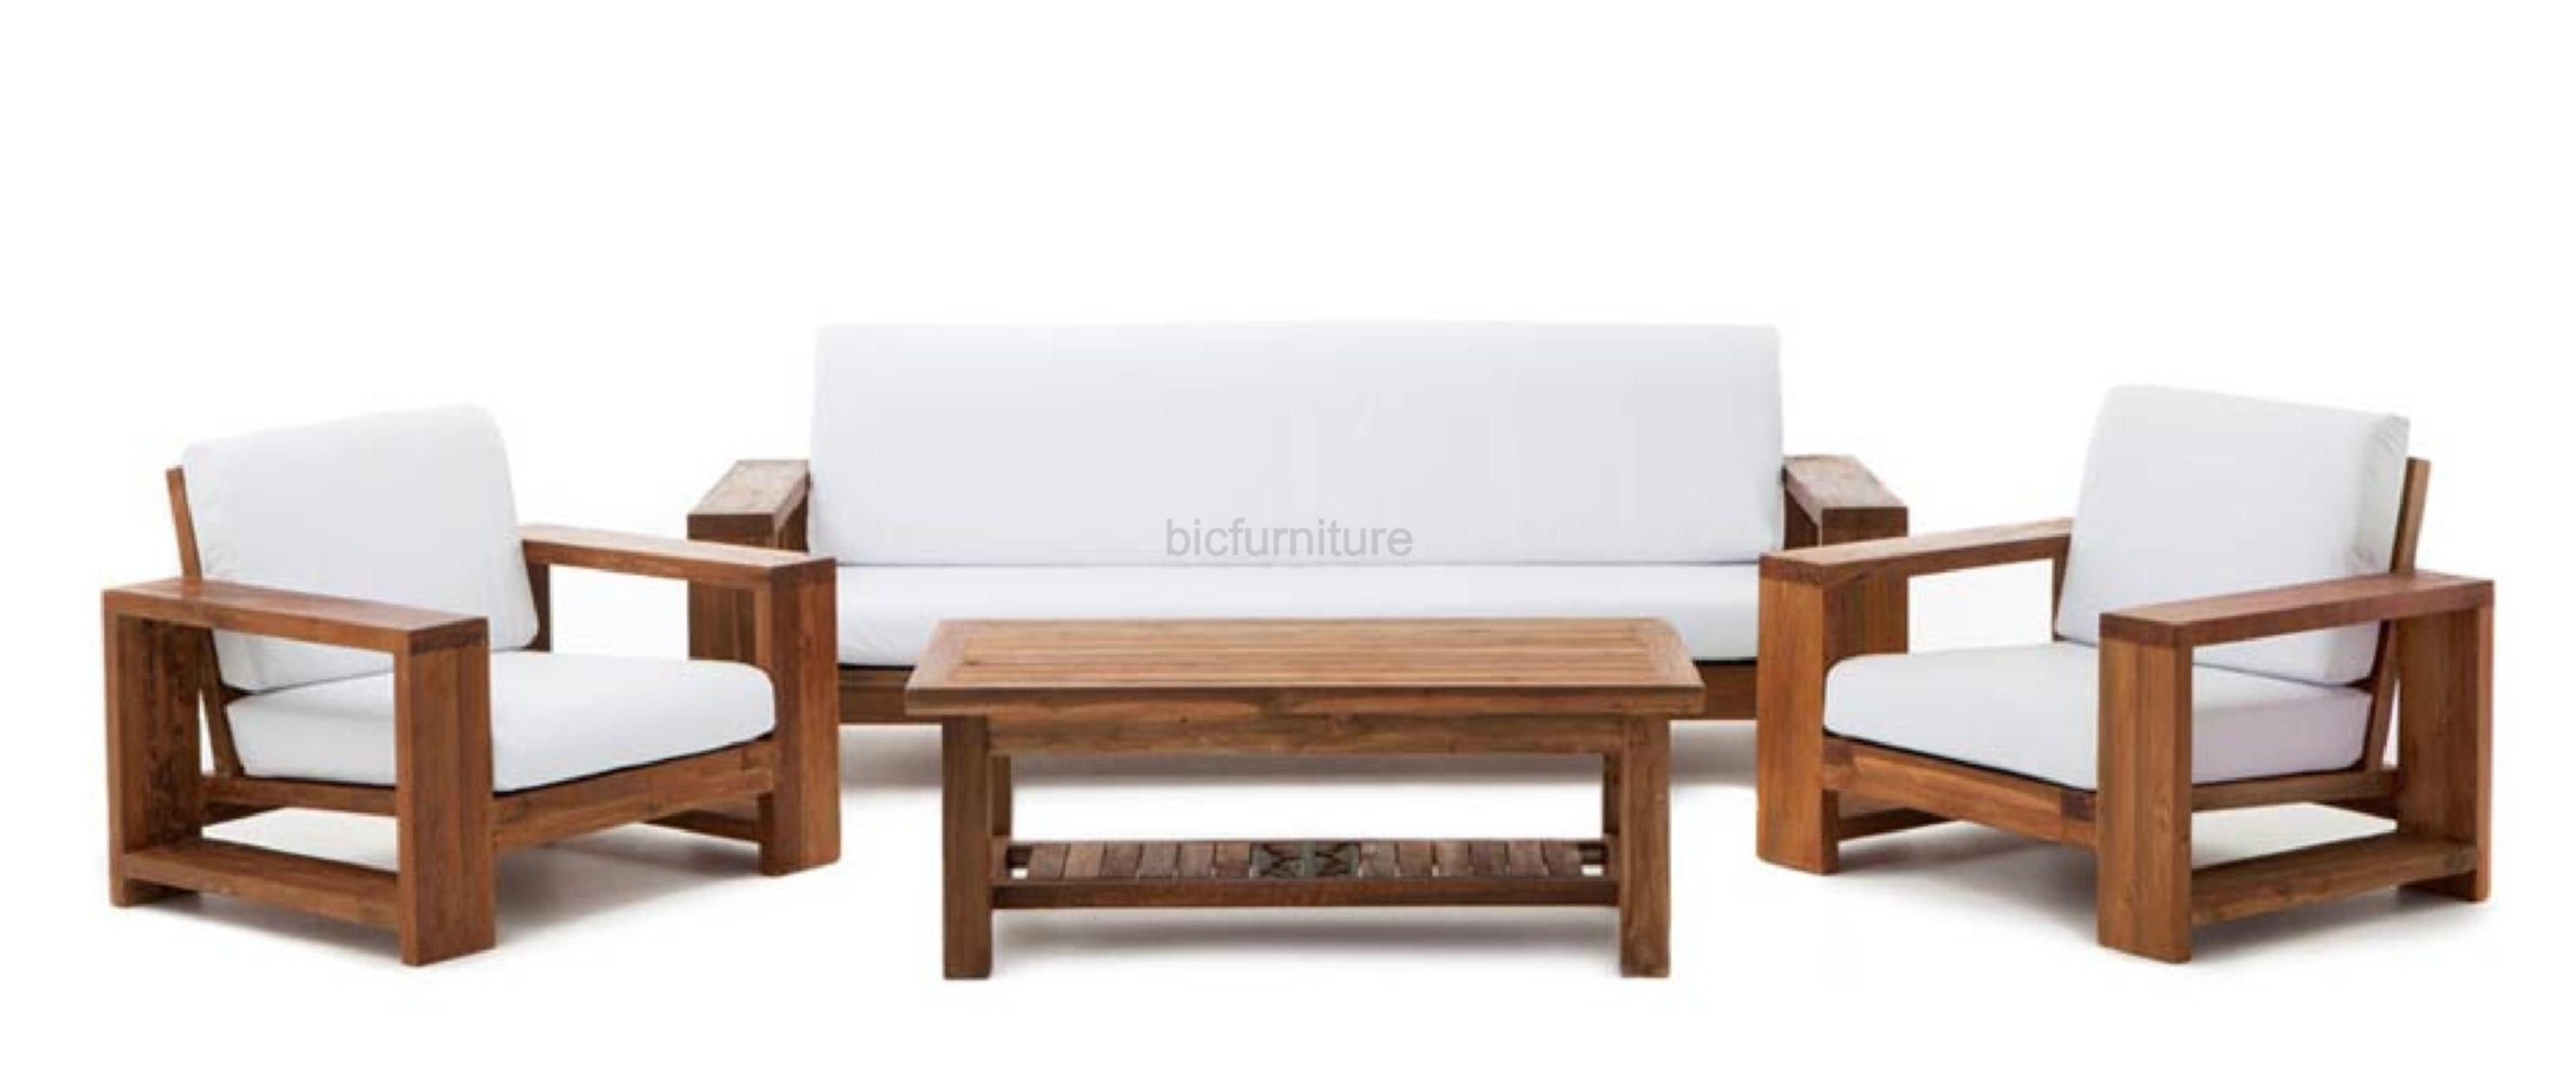 sofa set showroom in mumbai beds portland oregon wooden usa teak wood ws 60 details bic